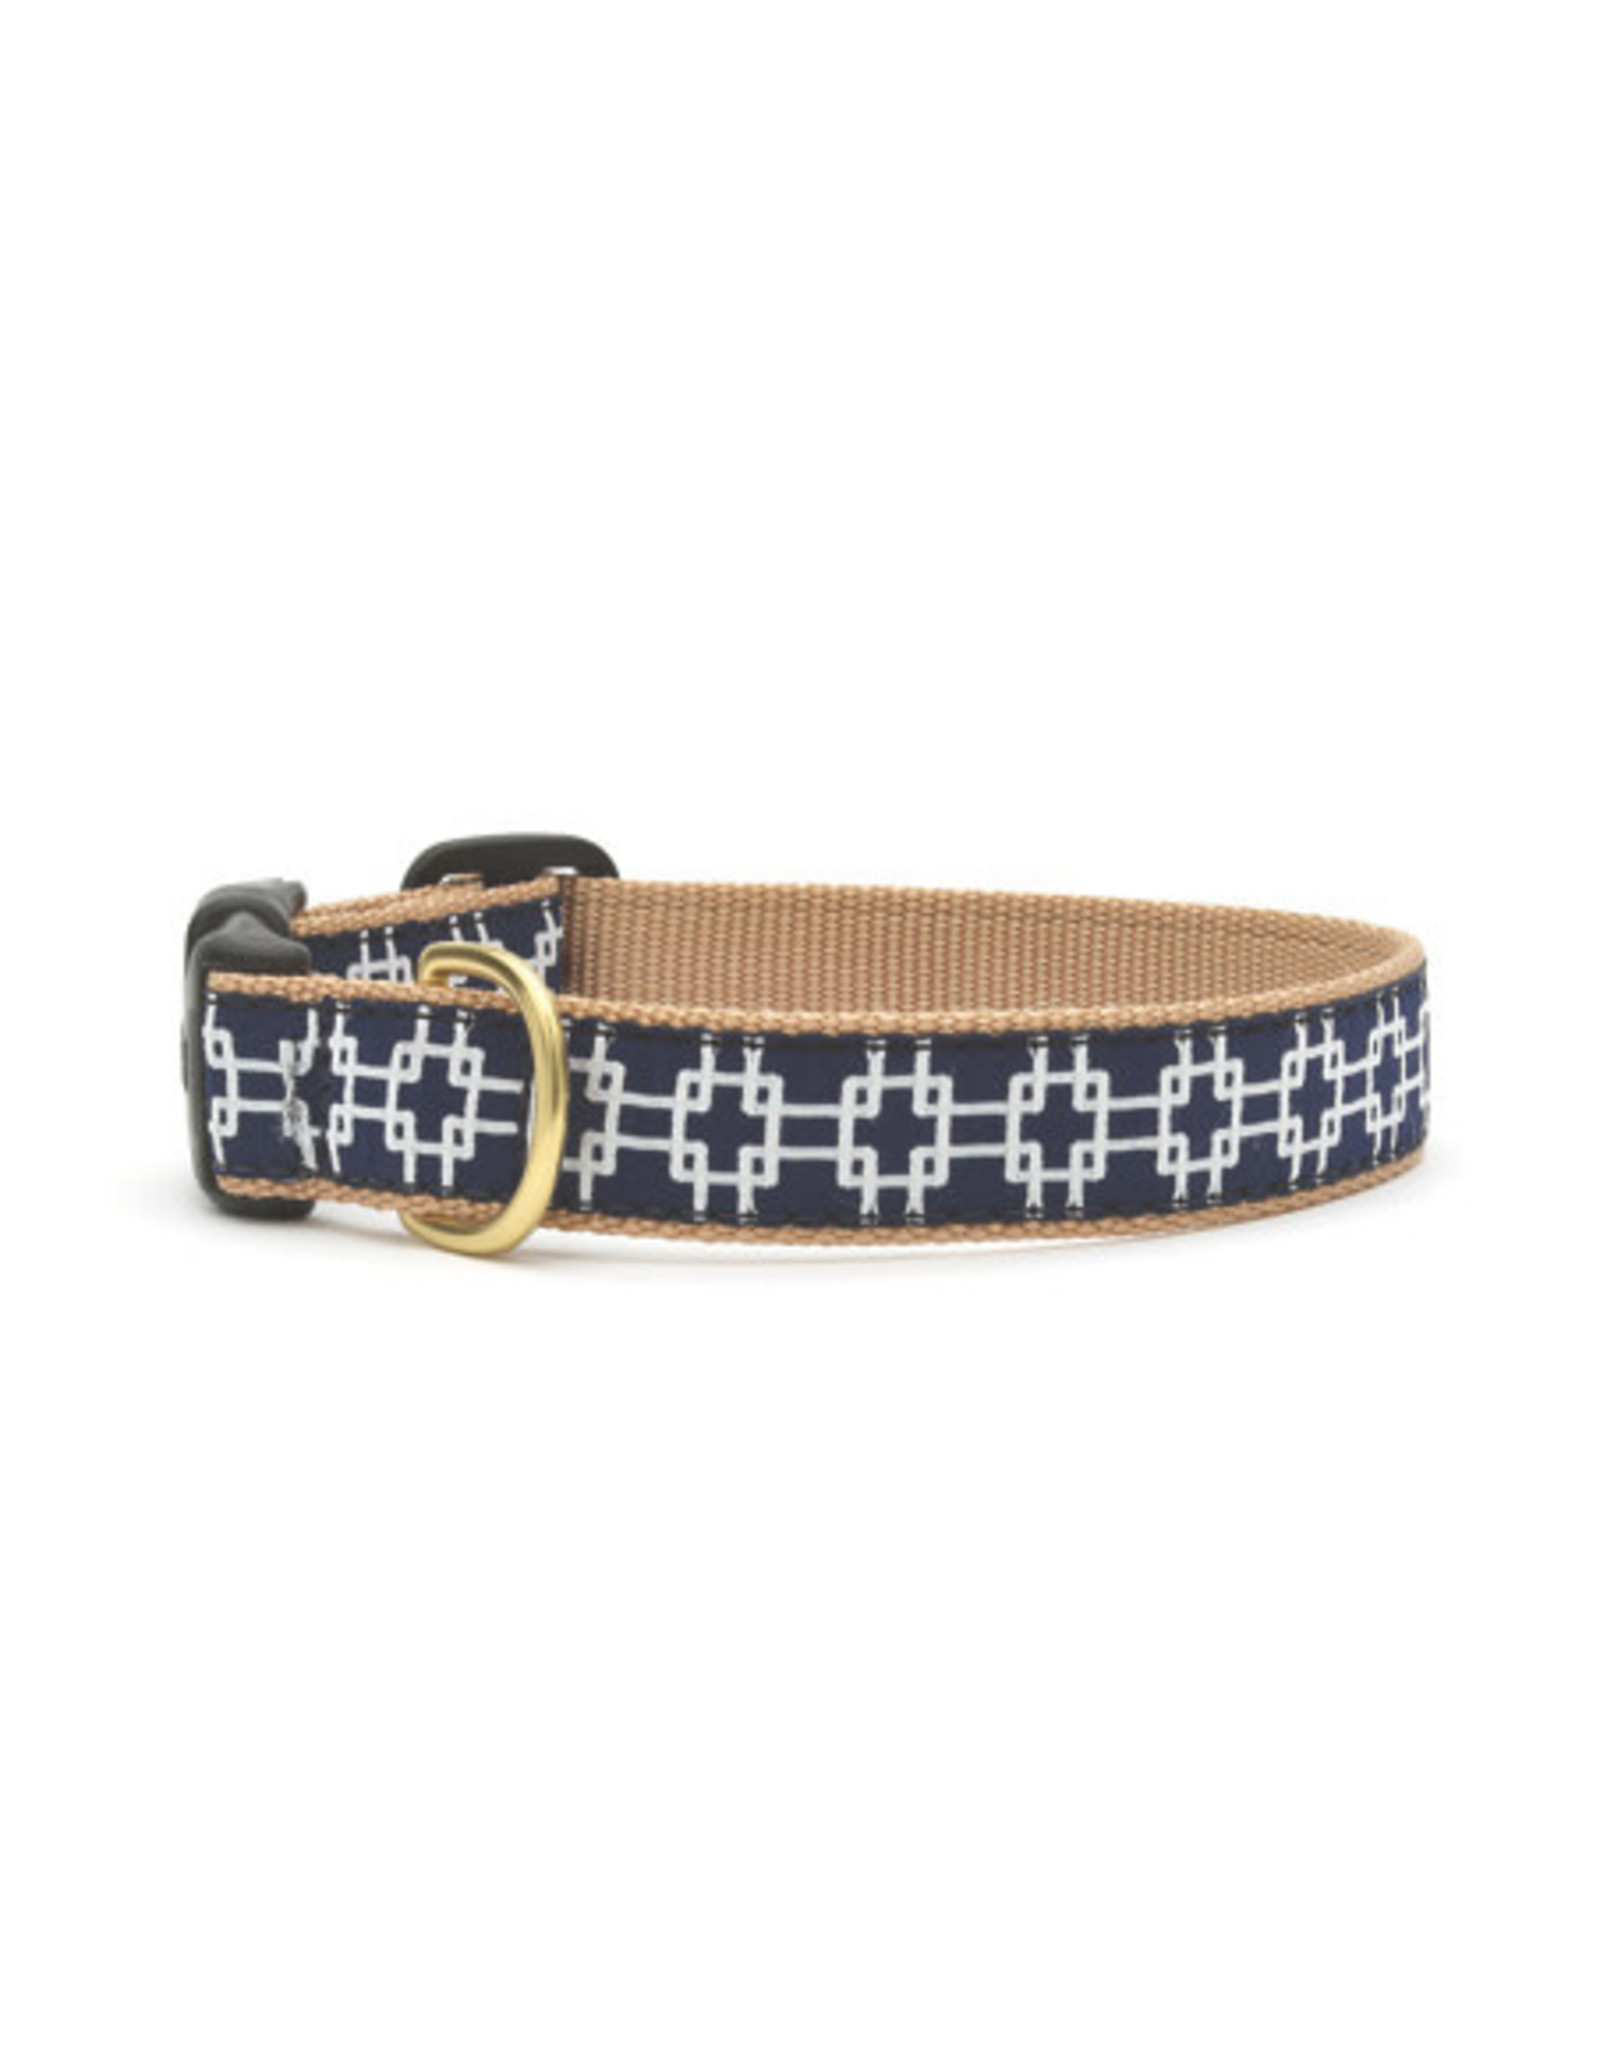 Up Country Gridlock Collar: Narrow, S